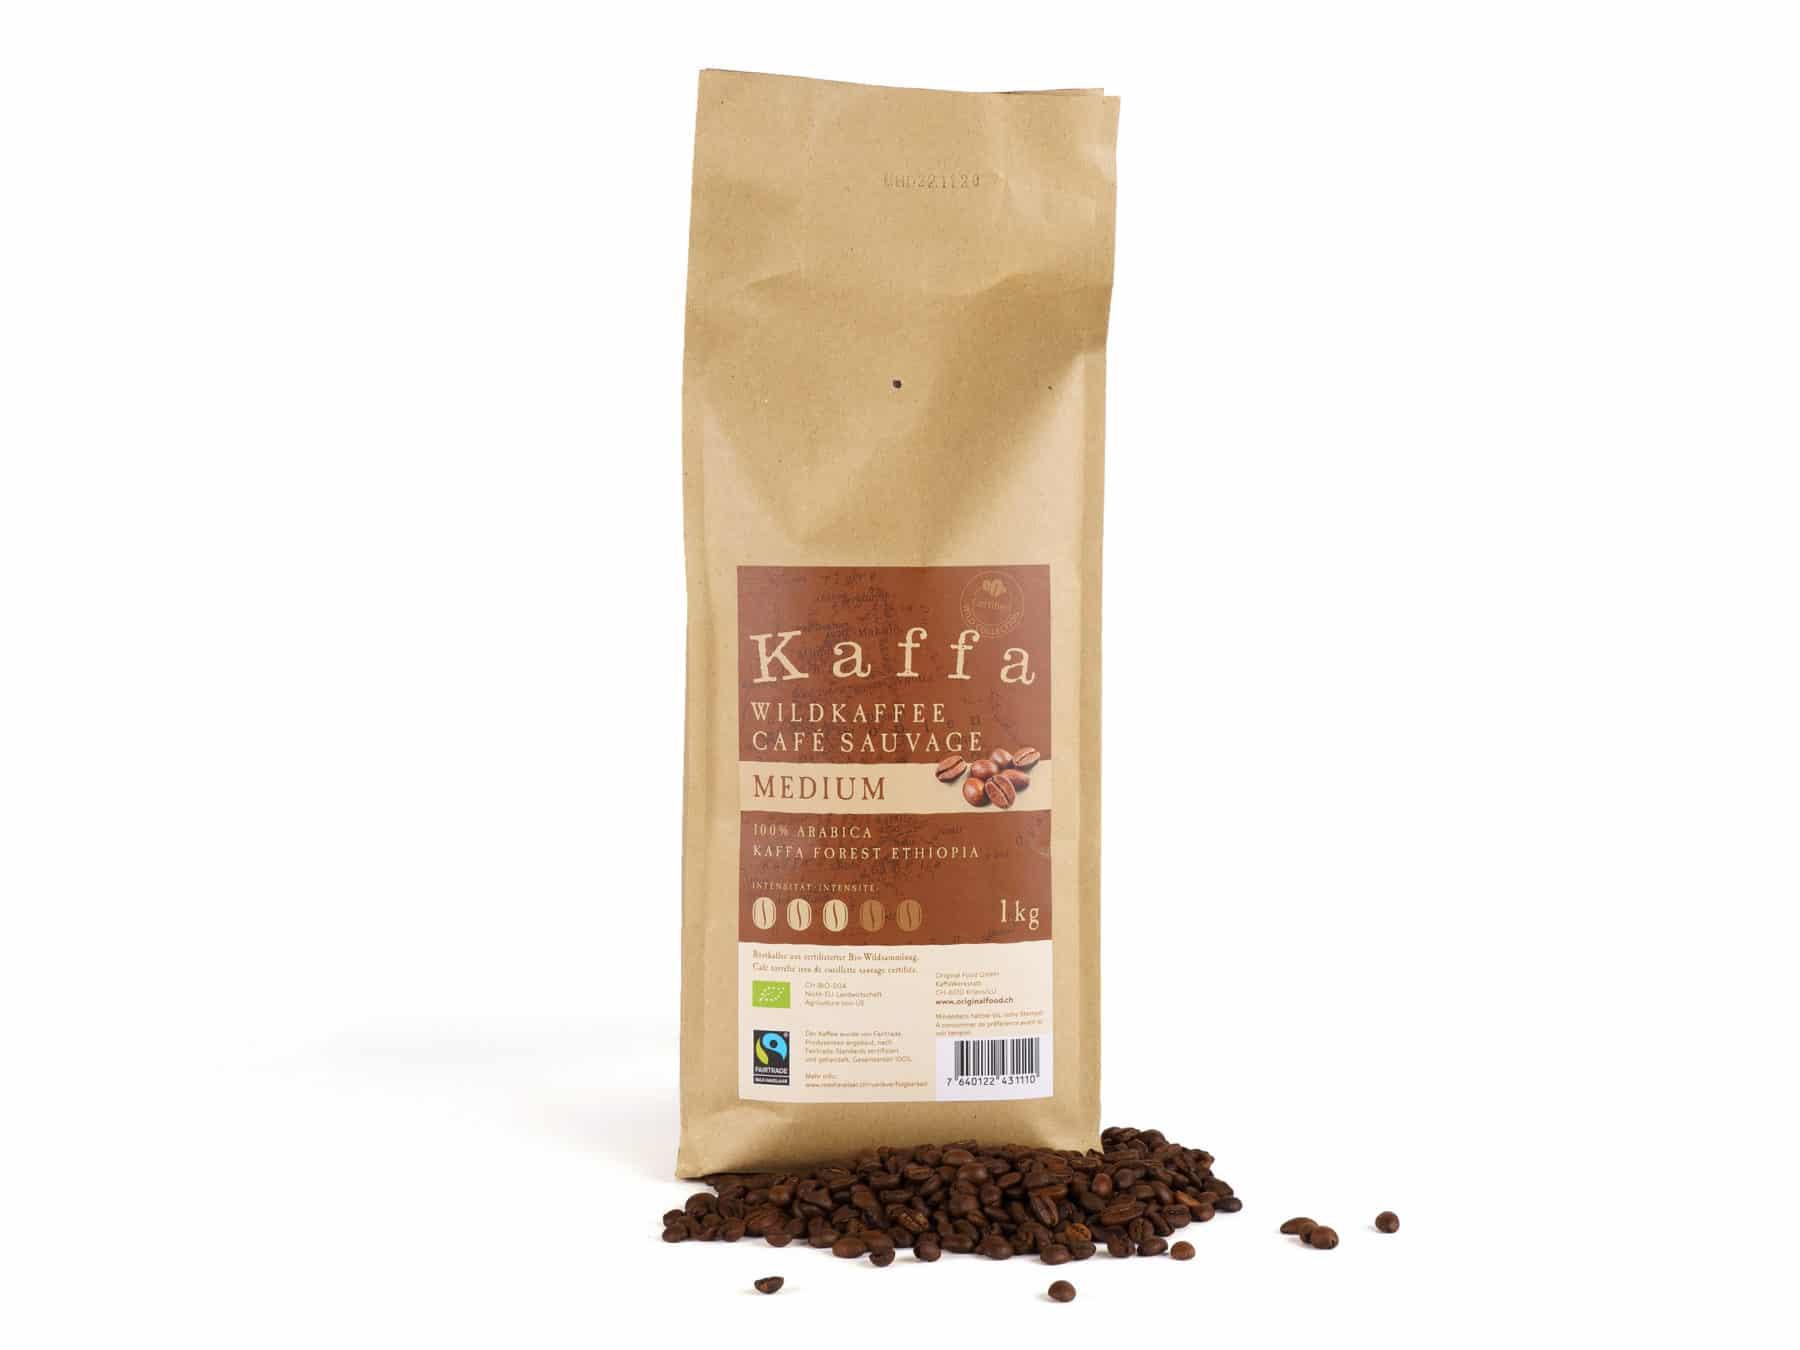 Kaffa Wildkaffee Medium Original Food Bio KURTS